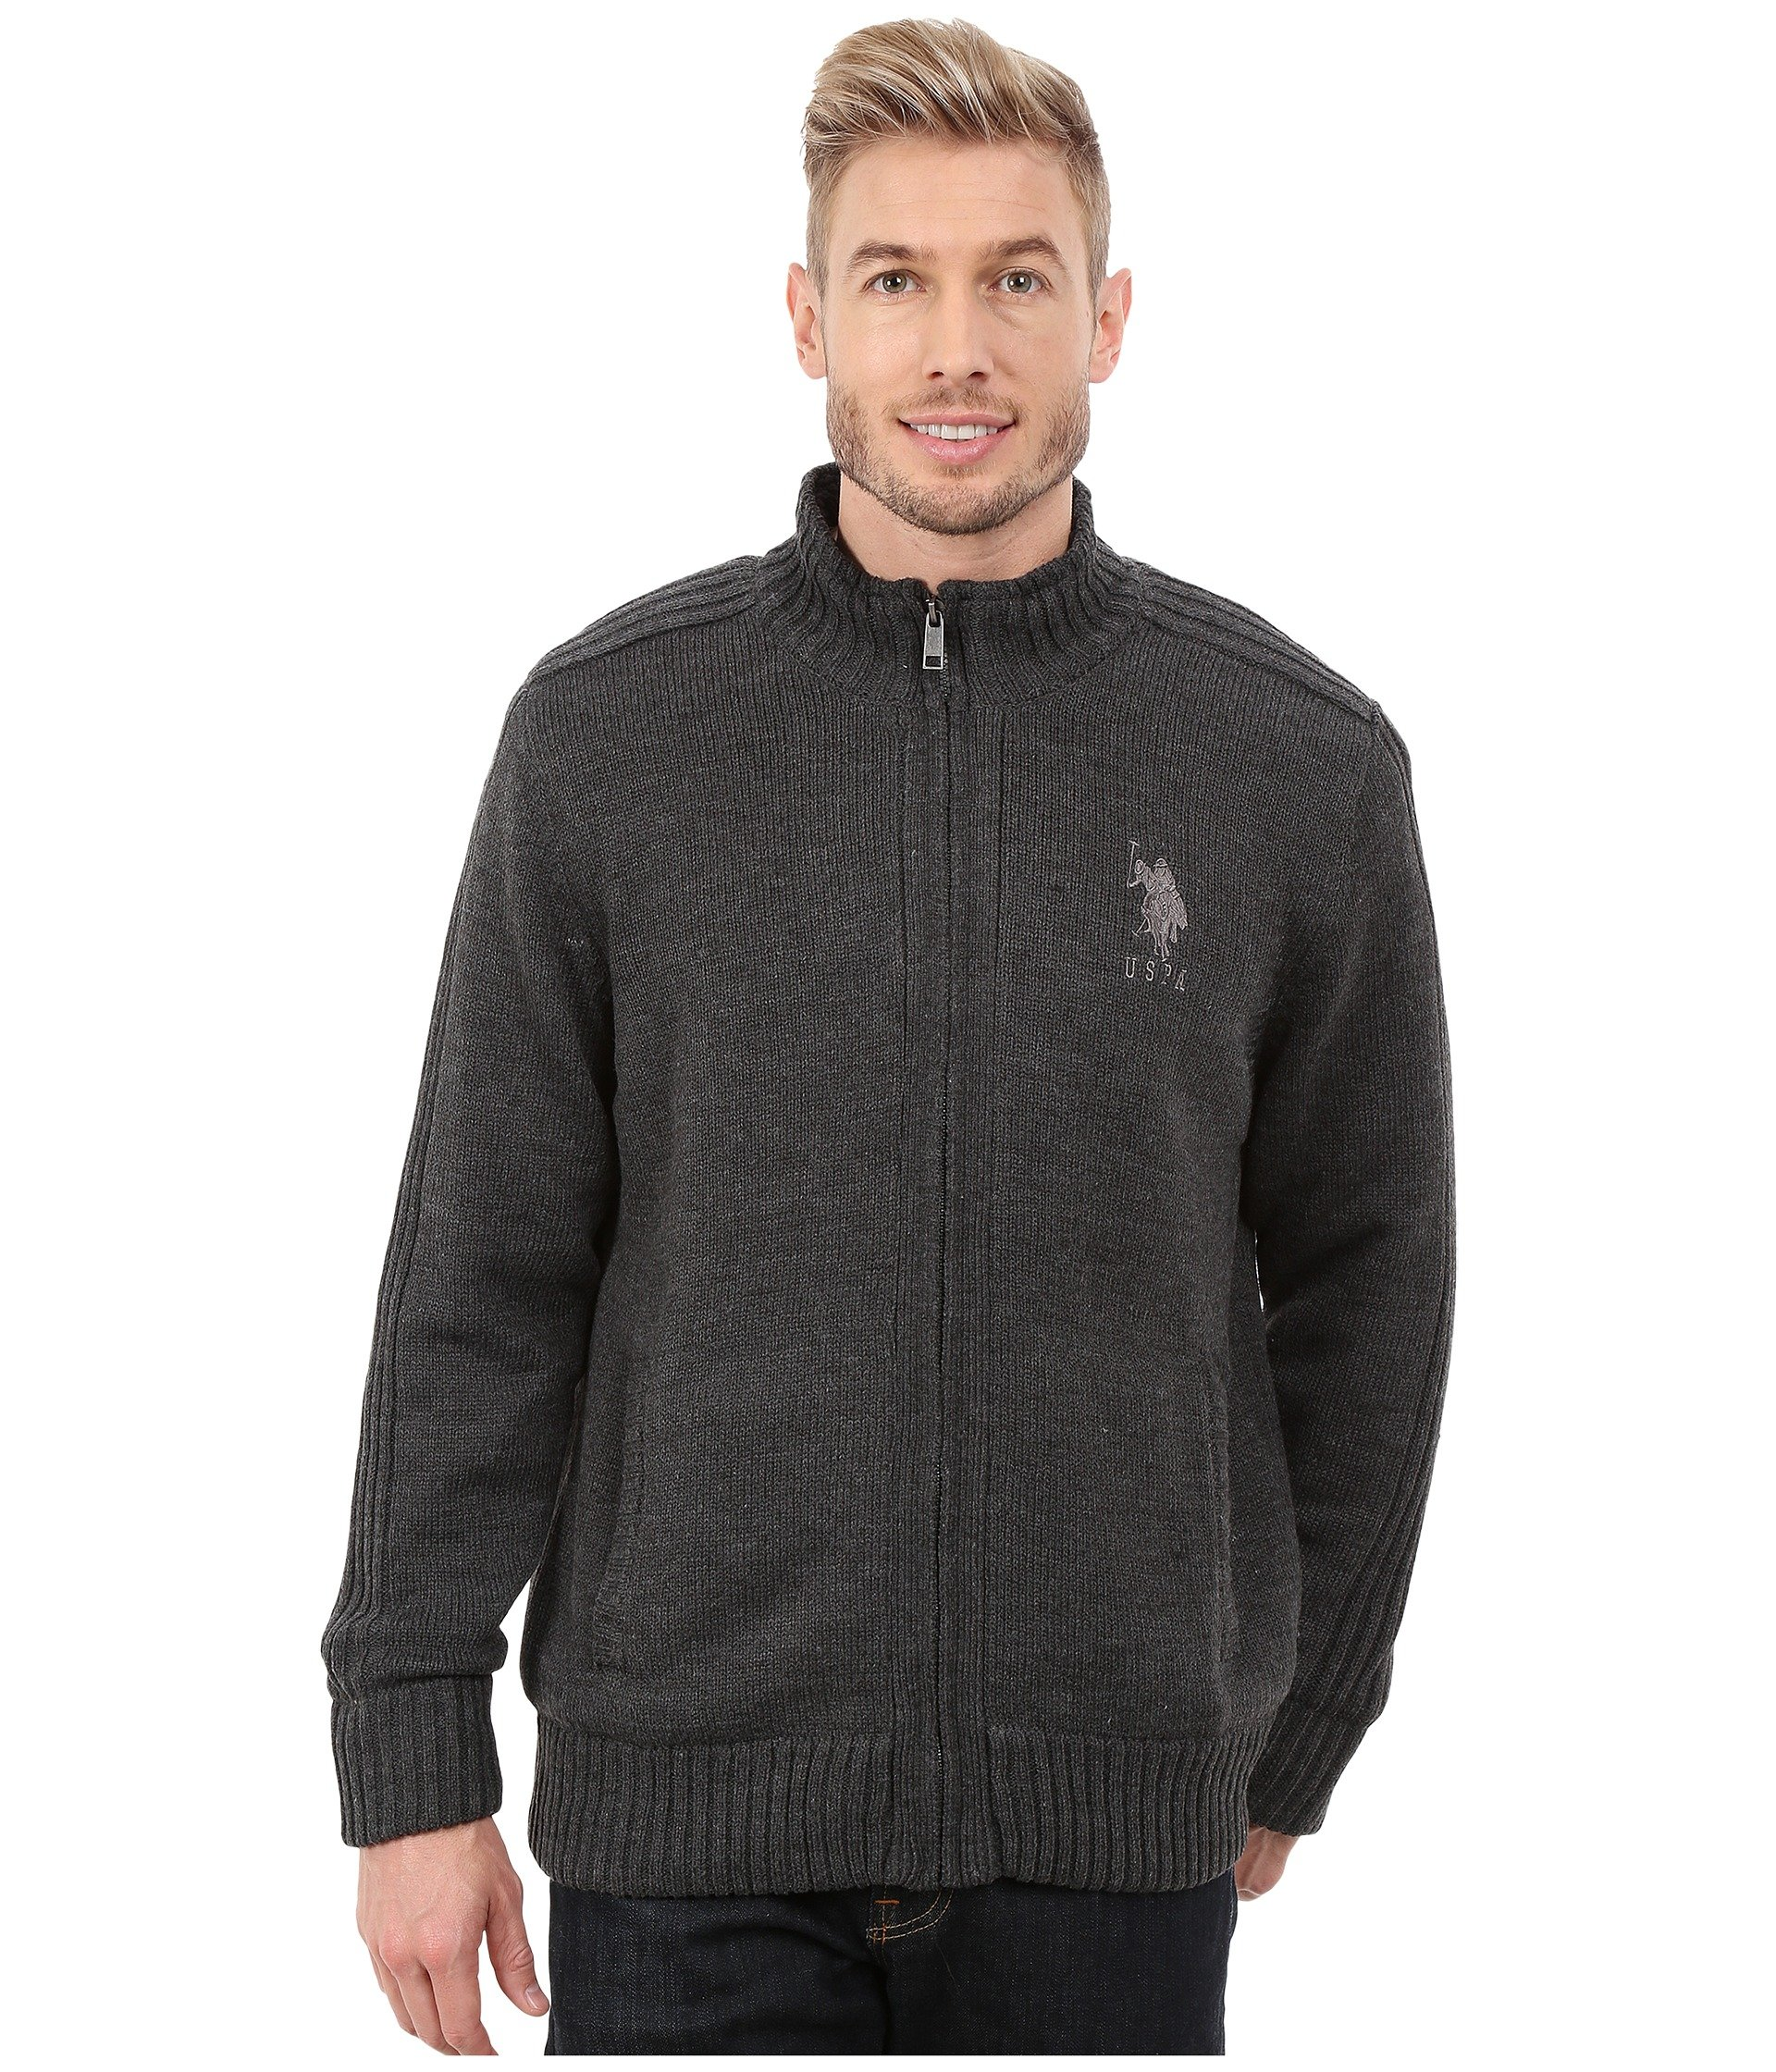 Sueter para Hombre U.S. POLO ASSN. Sherpa Lined Sweater  + U.S. POLO ASSN. en VeoyCompro.net